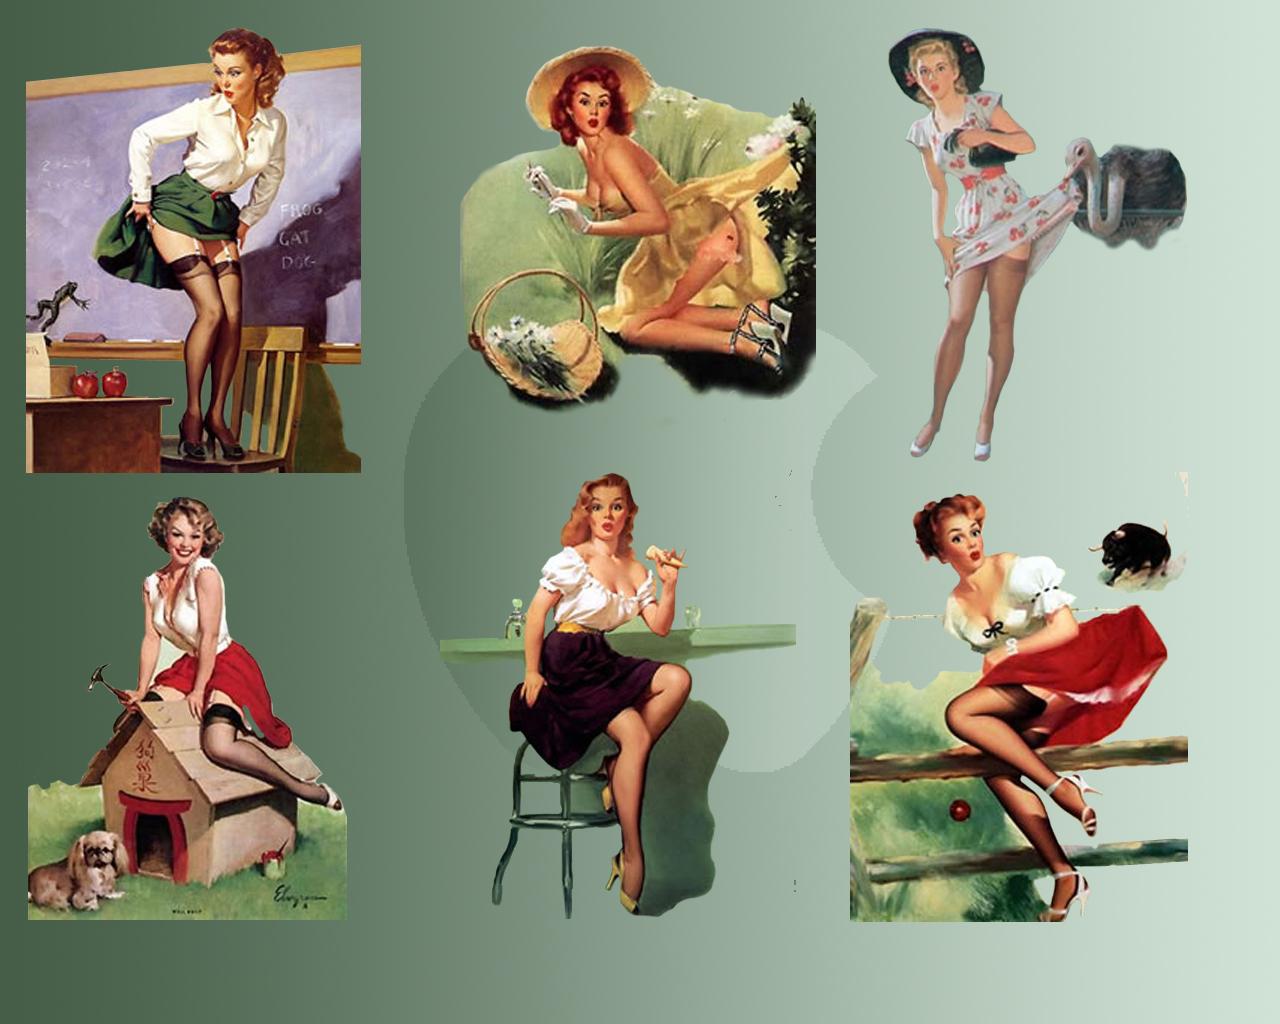 Pin up Girls Wallpapers   Wallpapers for dekstop 1280x1024